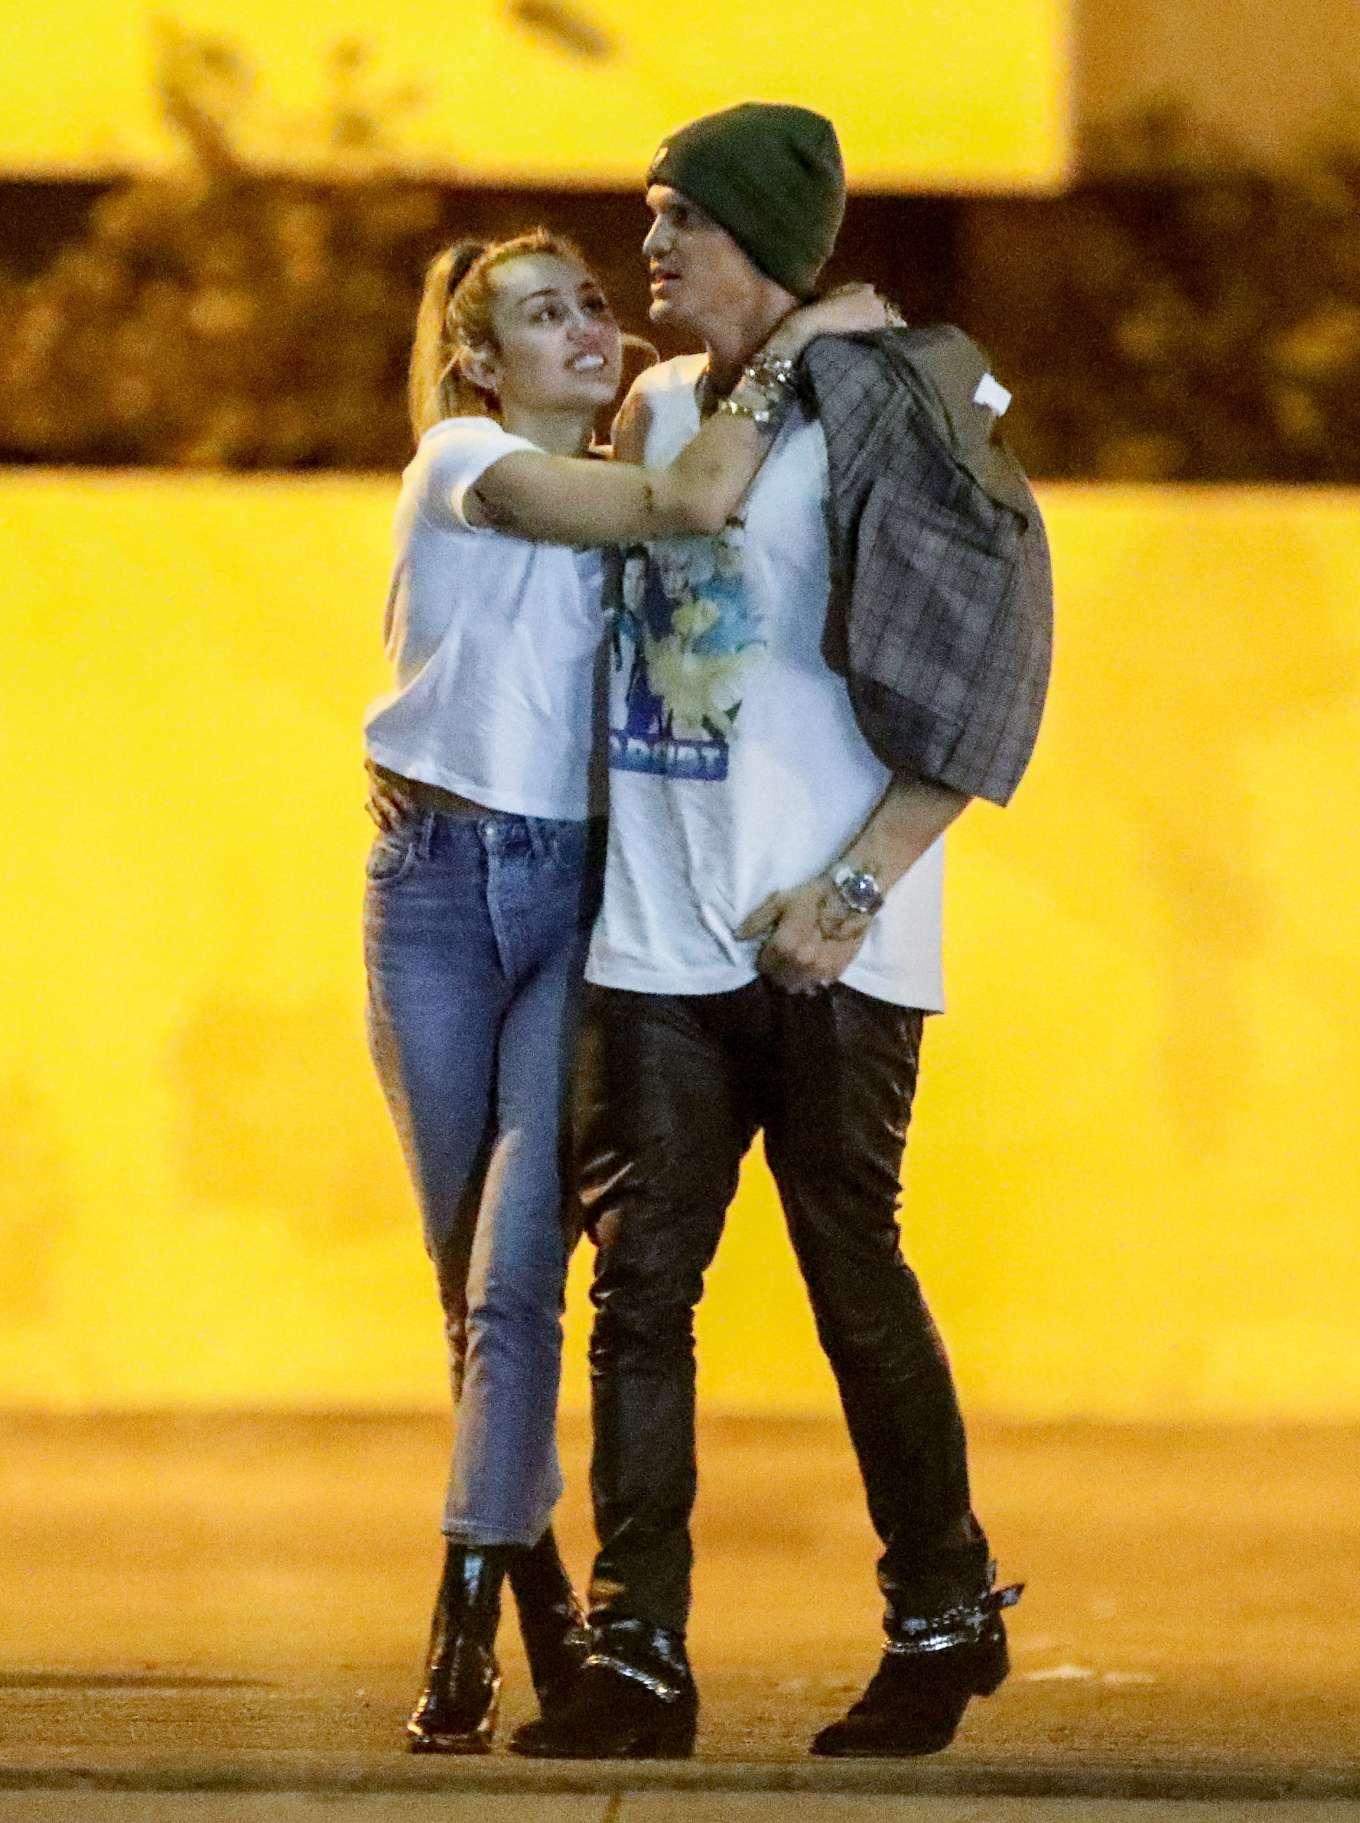 Miley Cyrus and Cody Simpson - Nightout in Studio City